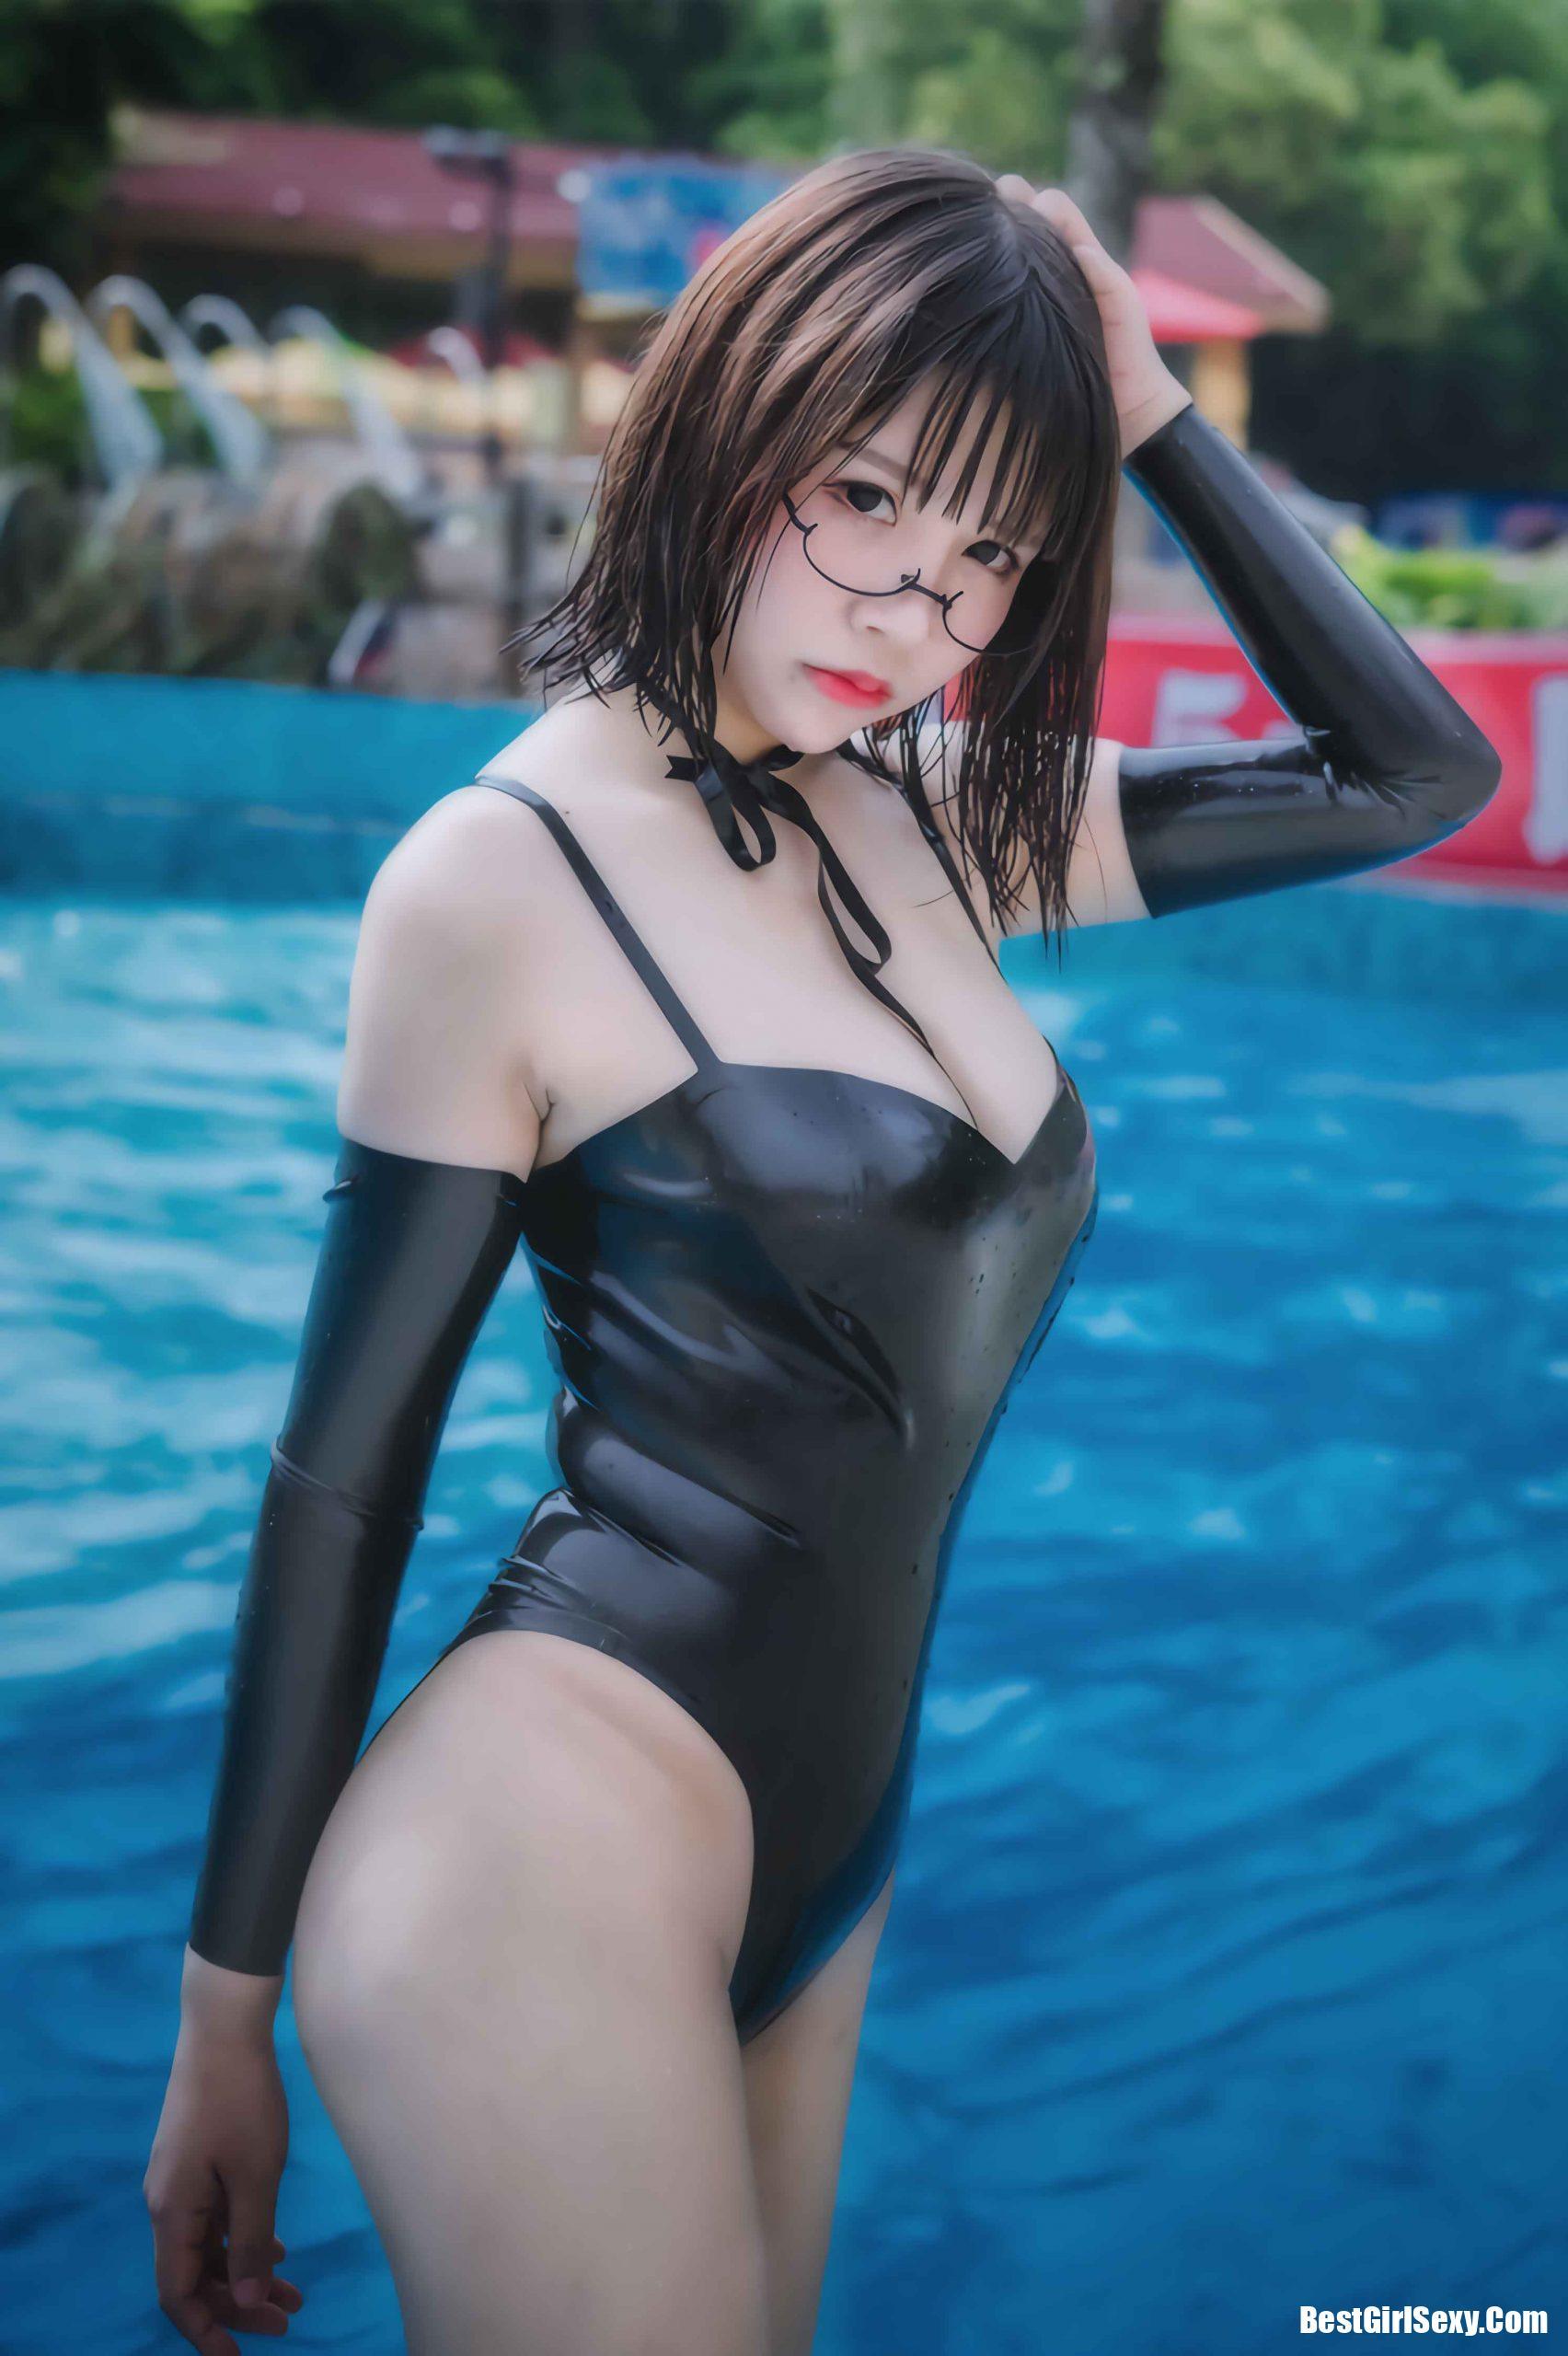 抱走莫子A_NO.001 Firefly Chimelong Water Park Black latex swimsuit